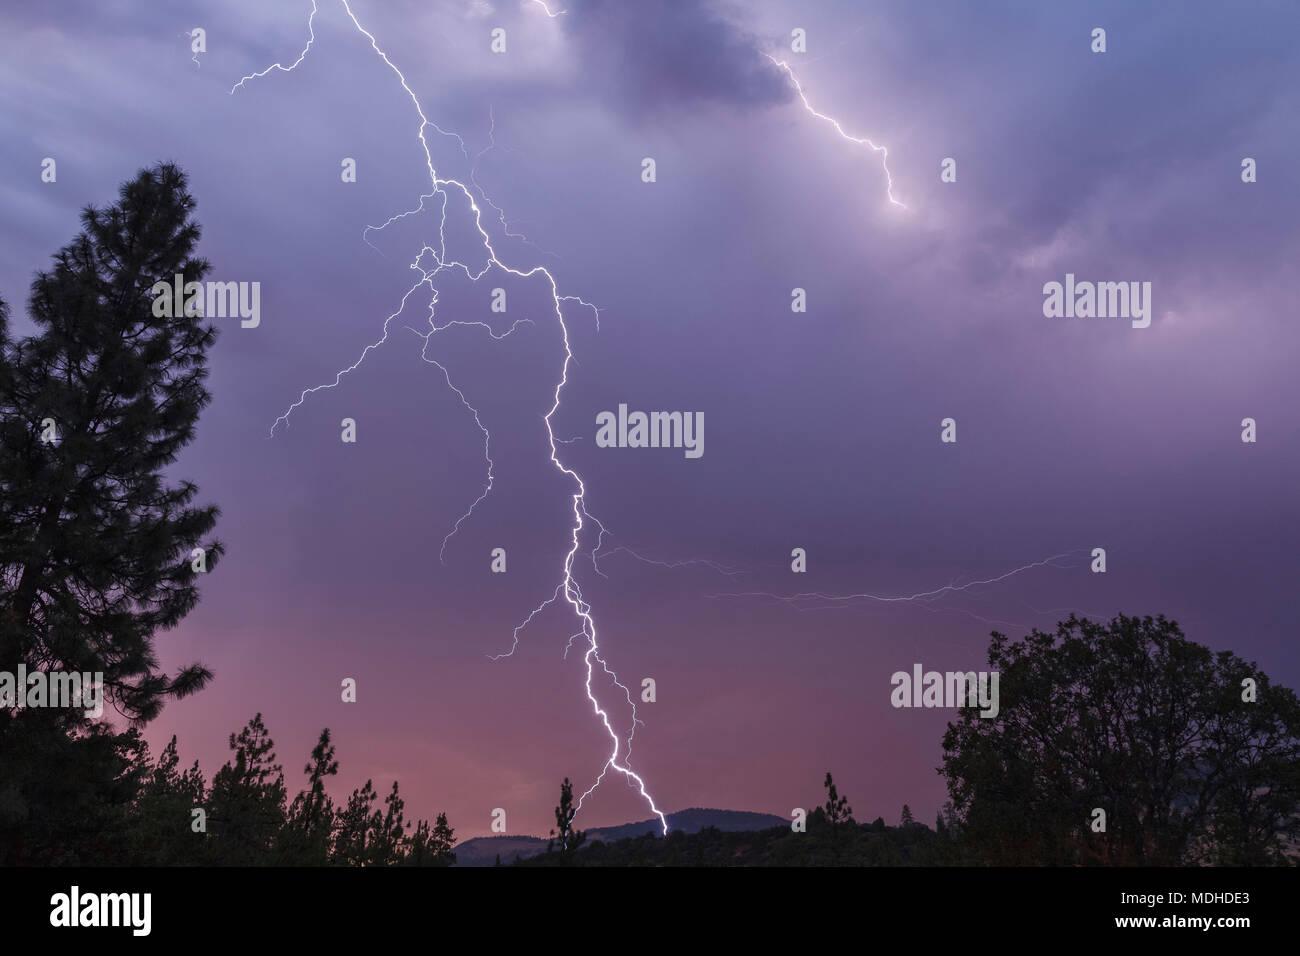 Lightning bolt strikes in this spectacular late evening image, Cascade Siskiyou National Monument; Ashland, Oregon, United States of America Stock Photo